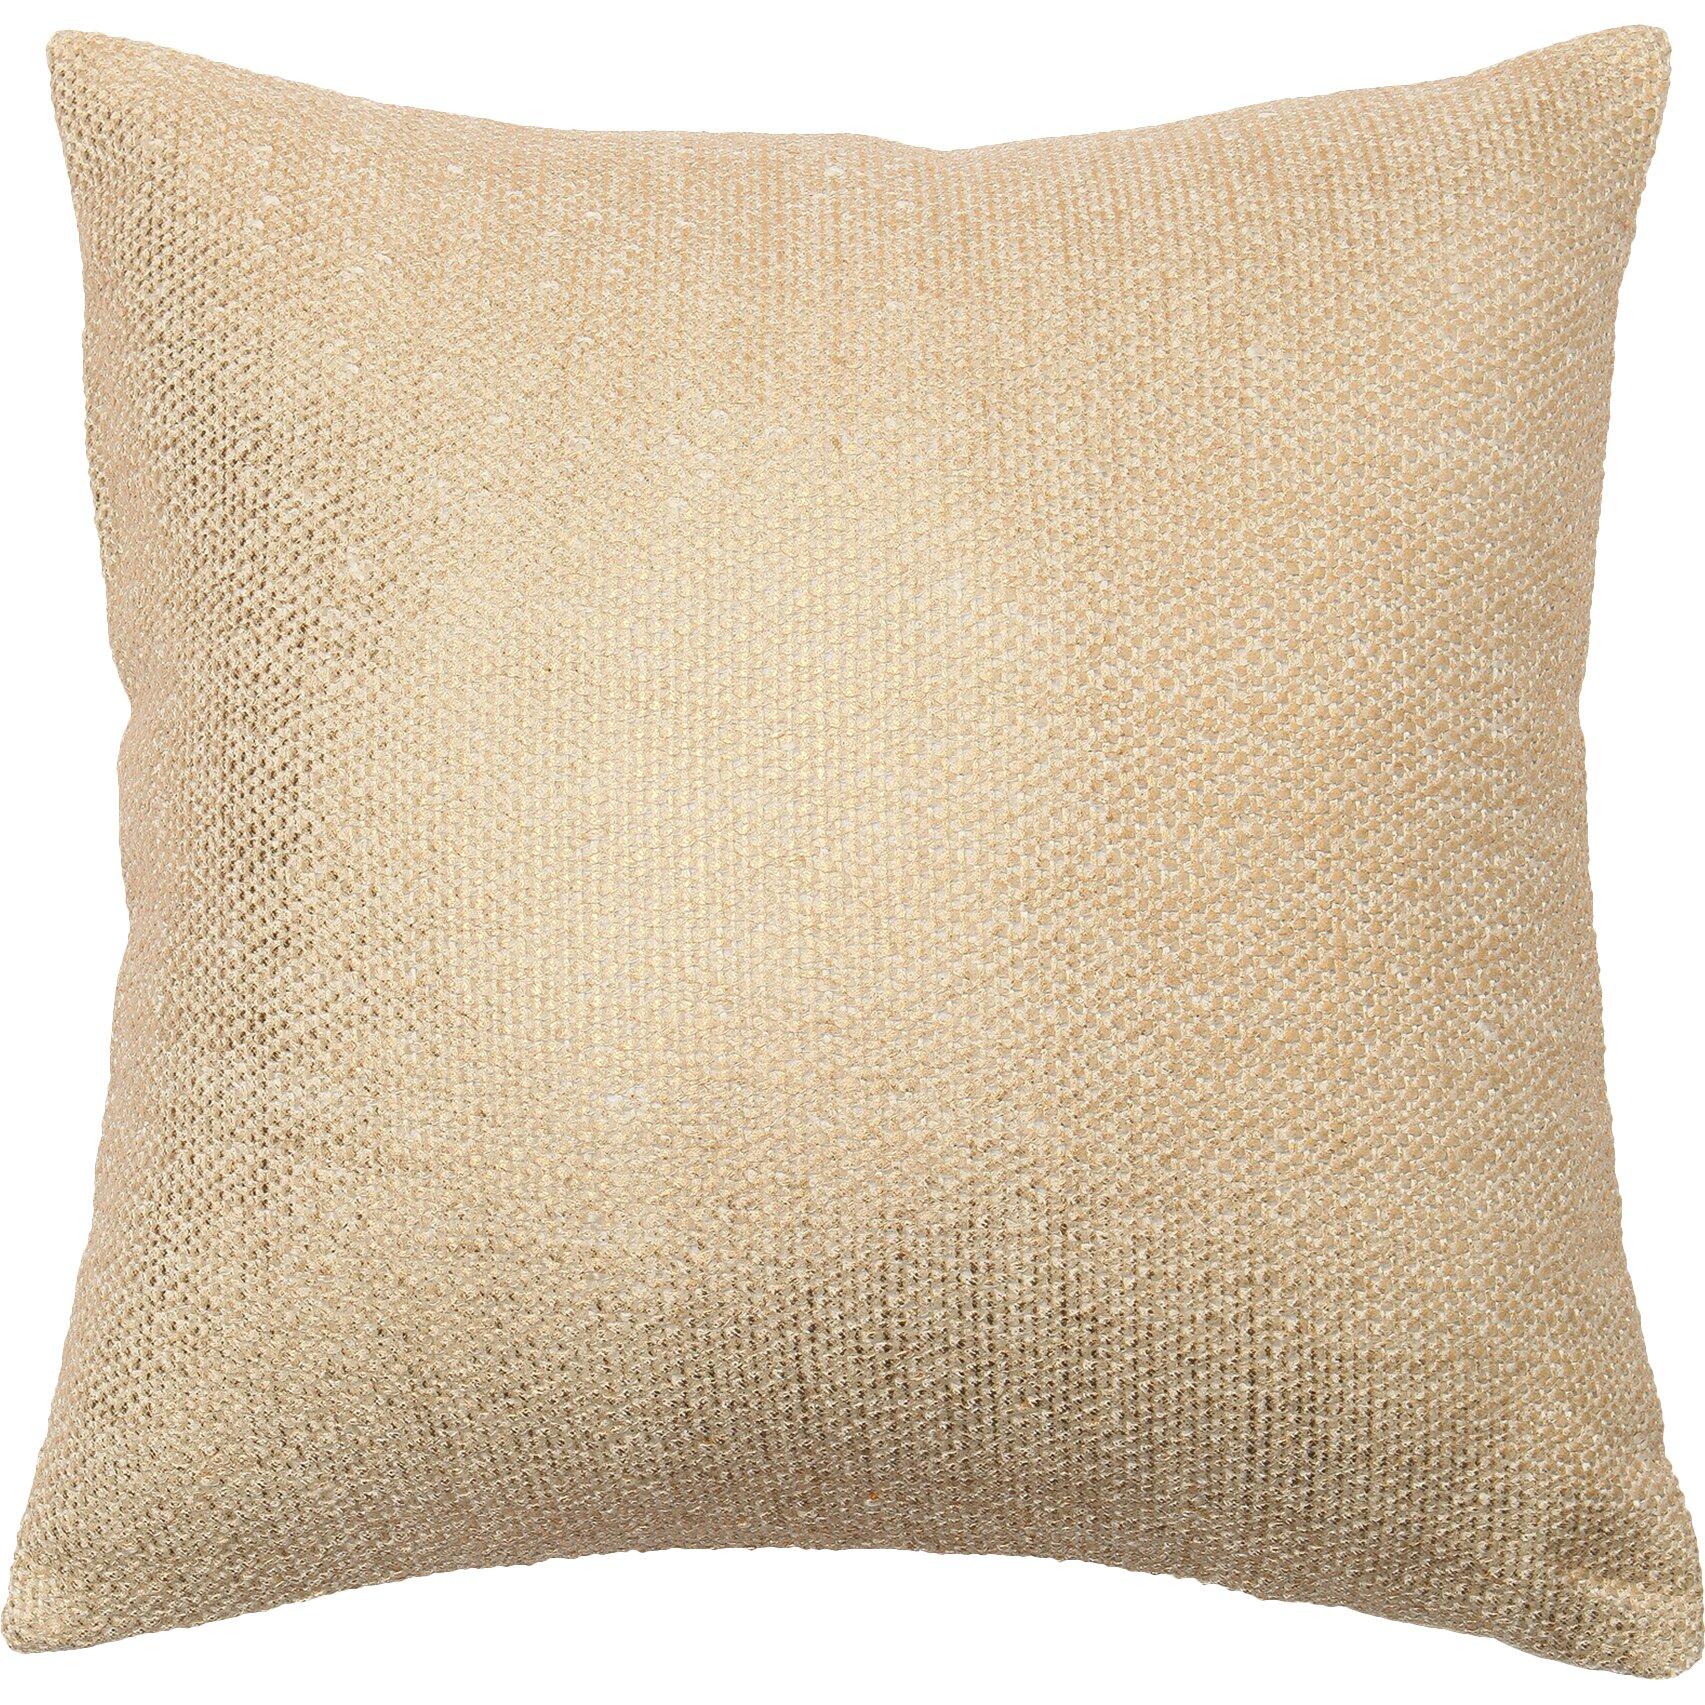 Best Home Fashion, Inc. Weave Throw Pillow Cover & Reviews Wayfair